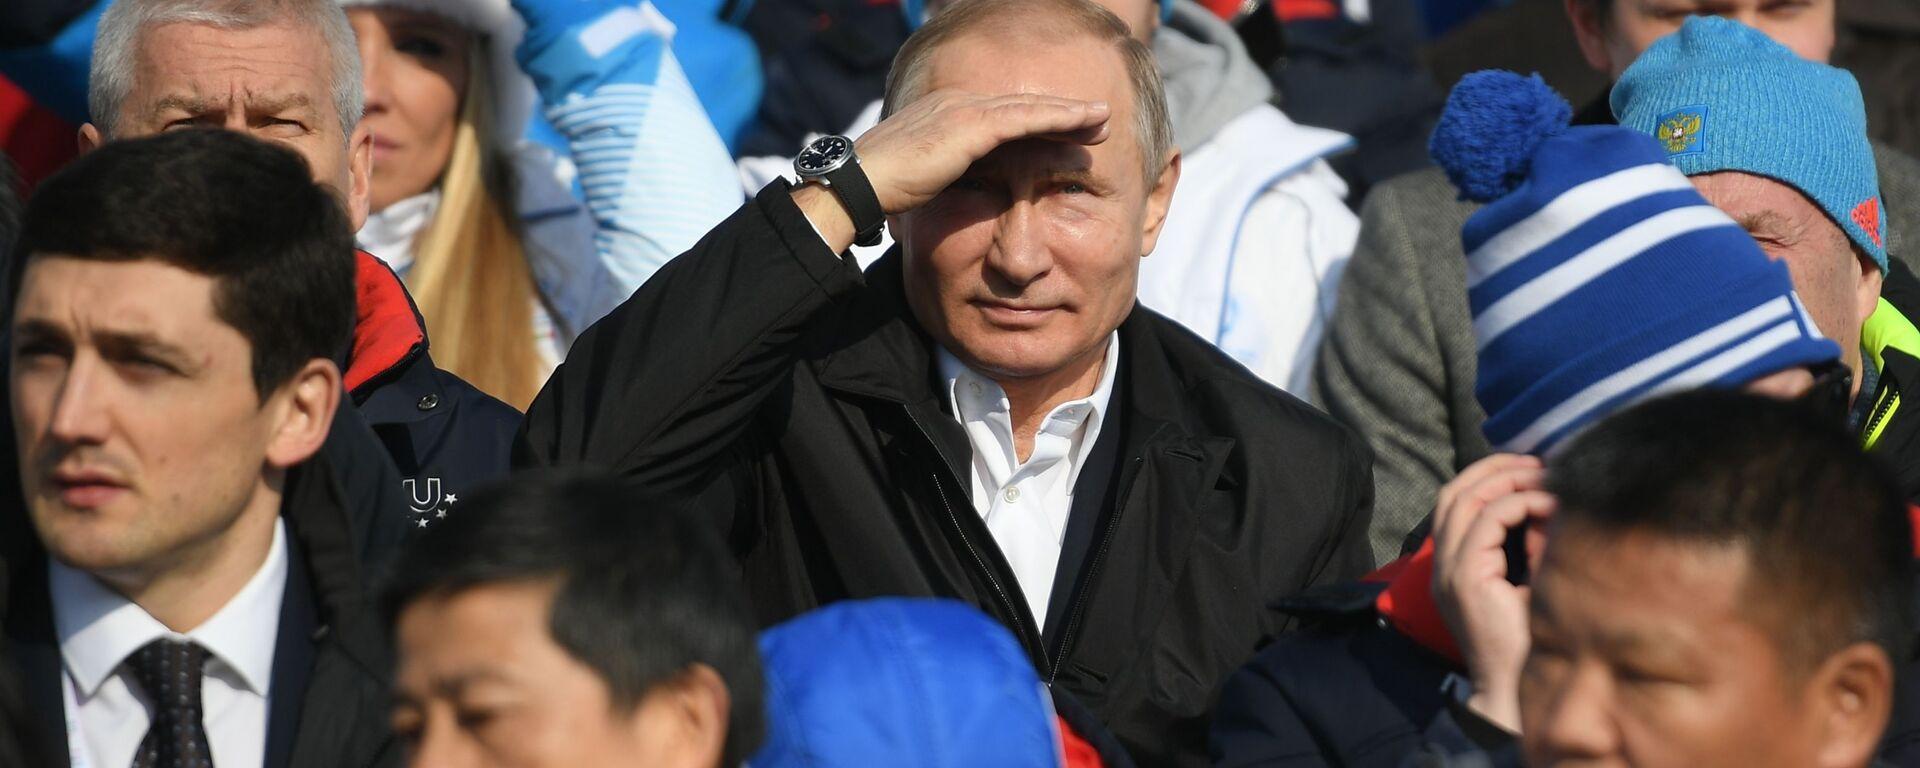 Prezydent Rosji Władimir Putin - Sputnik Polska, 1920, 23.10.2019